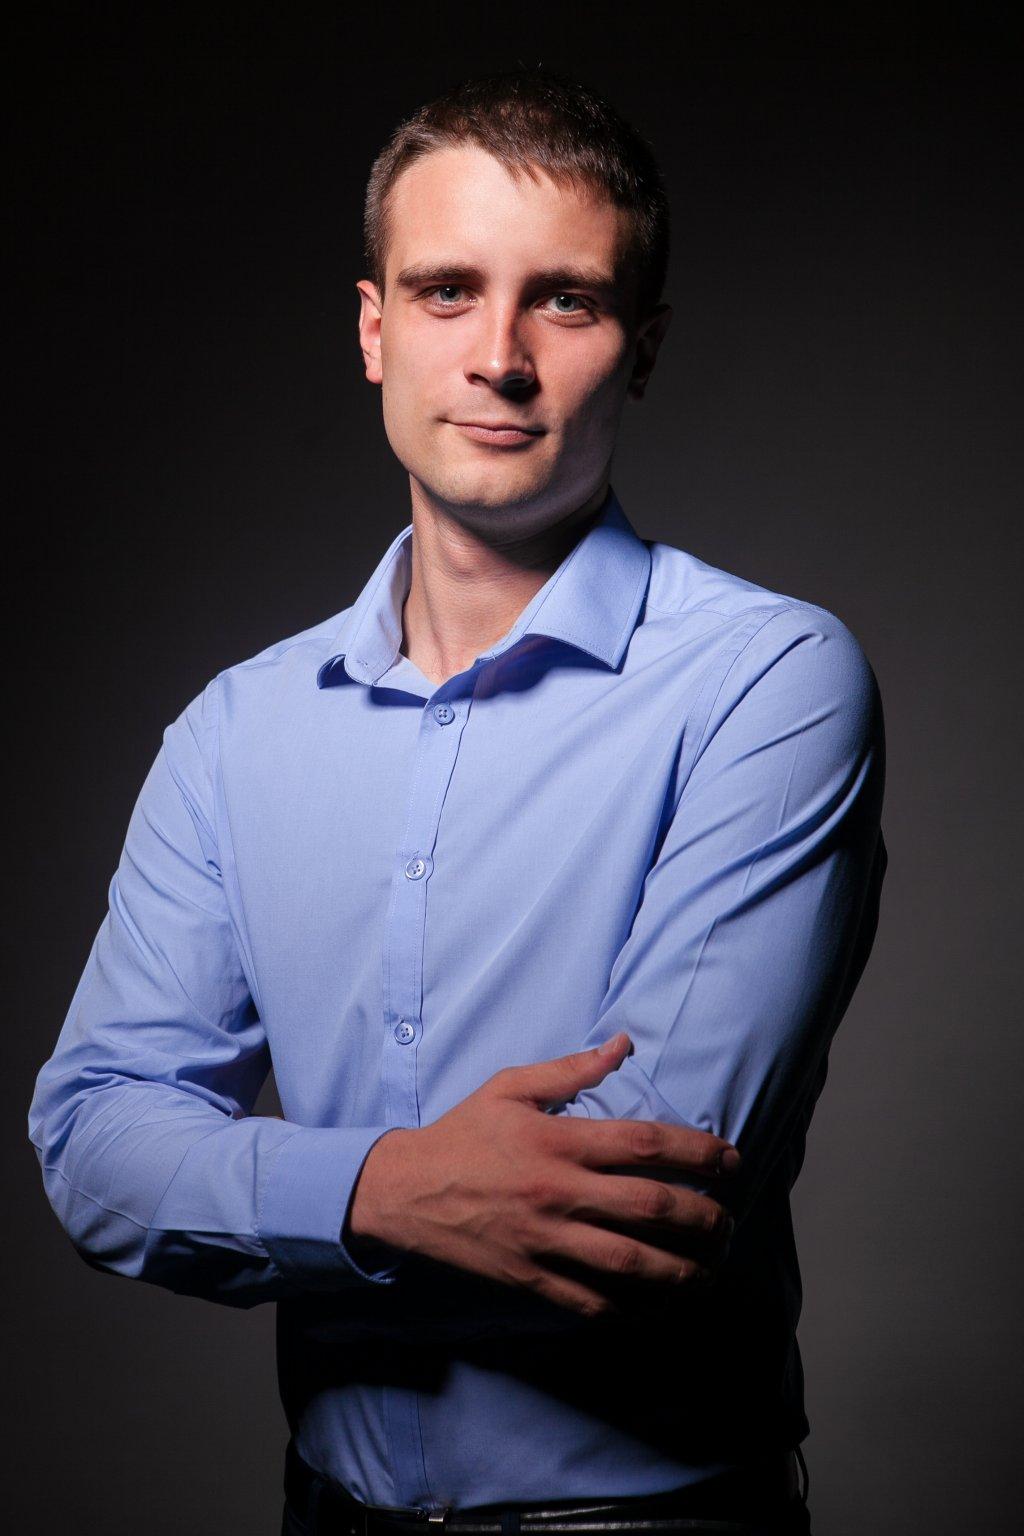 Max Kuśmierek